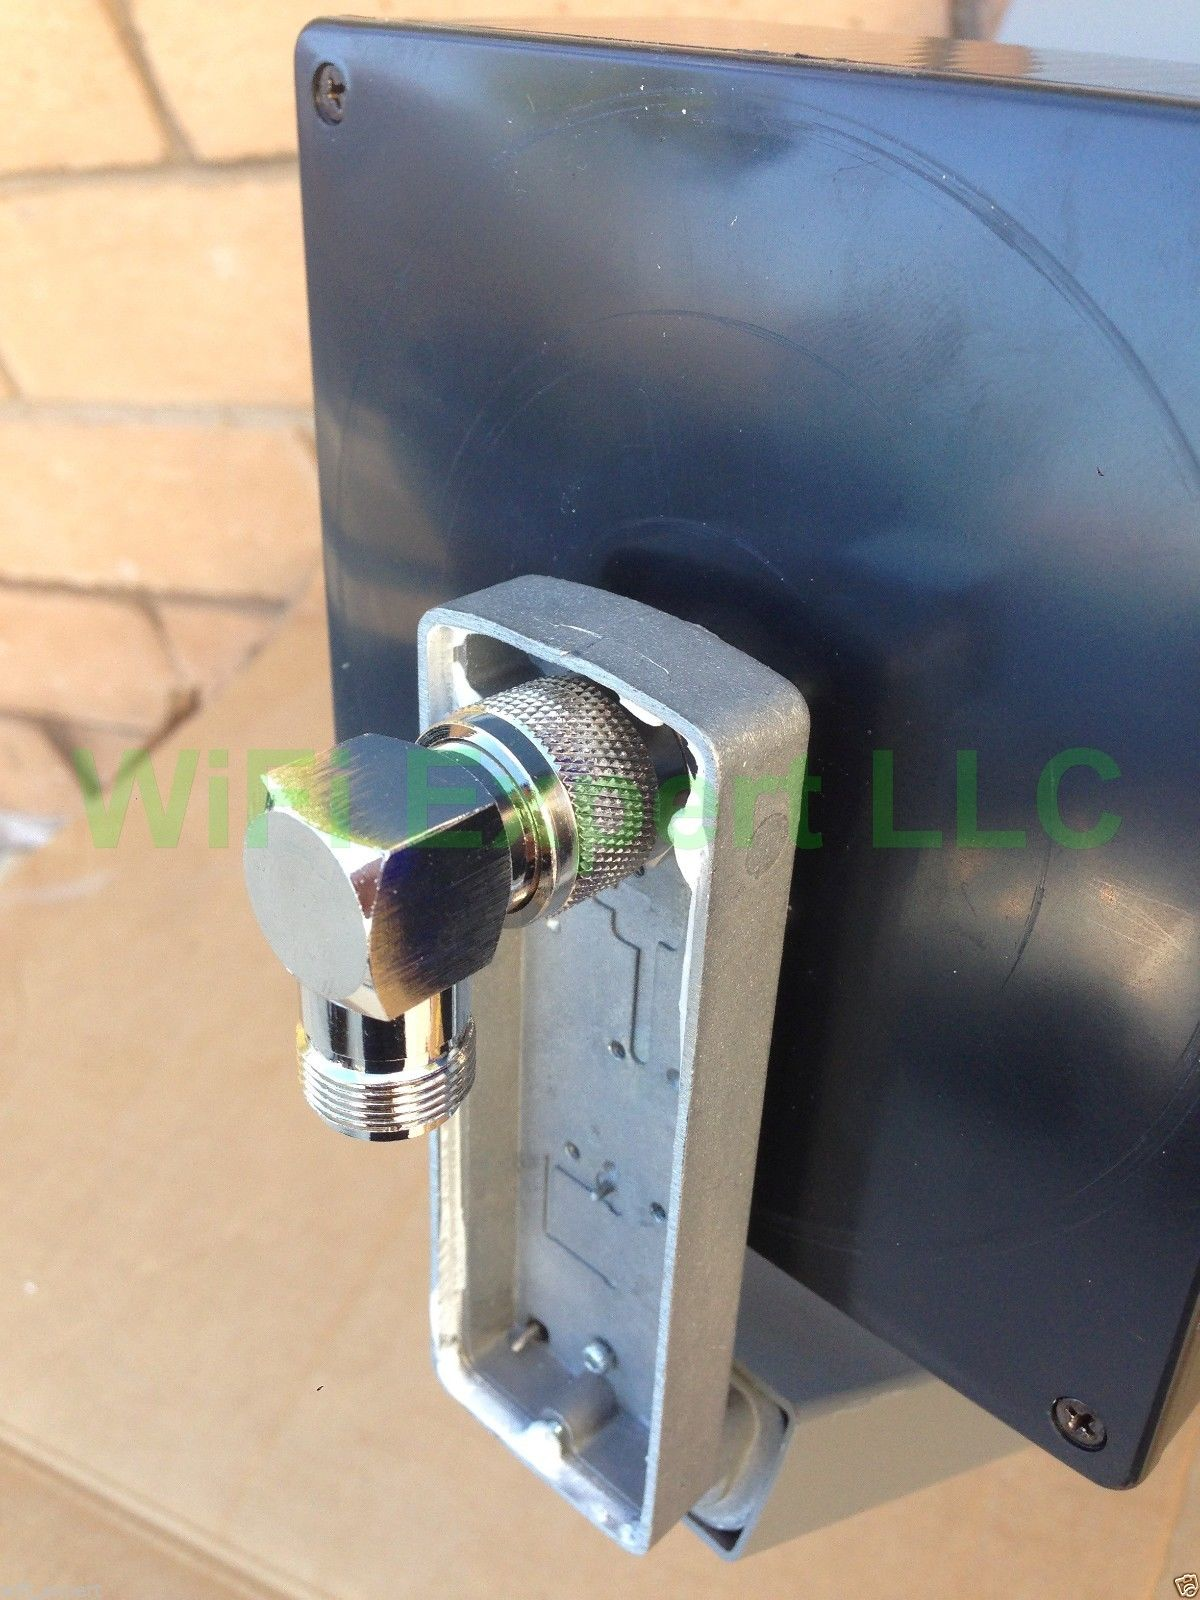 Dish Biquad Wifi Antenna Alfa Poe Tube 2h Outdoor